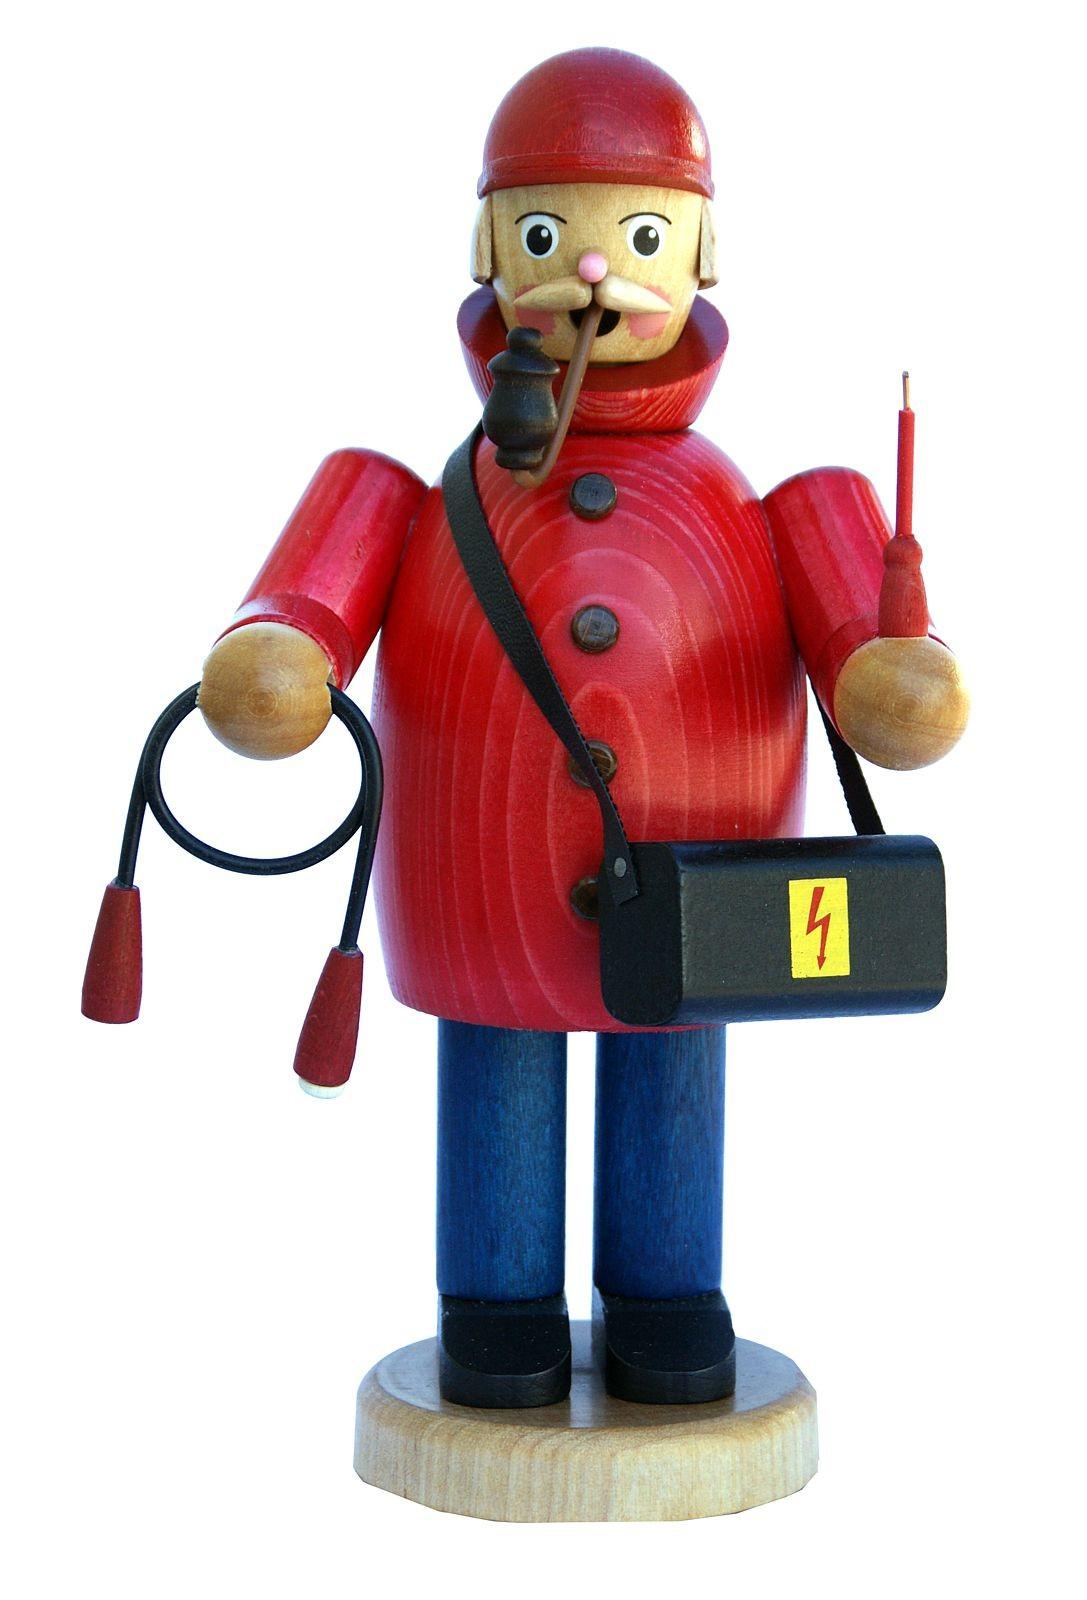 Räuchermännchen Elektriker mit roter Jacke